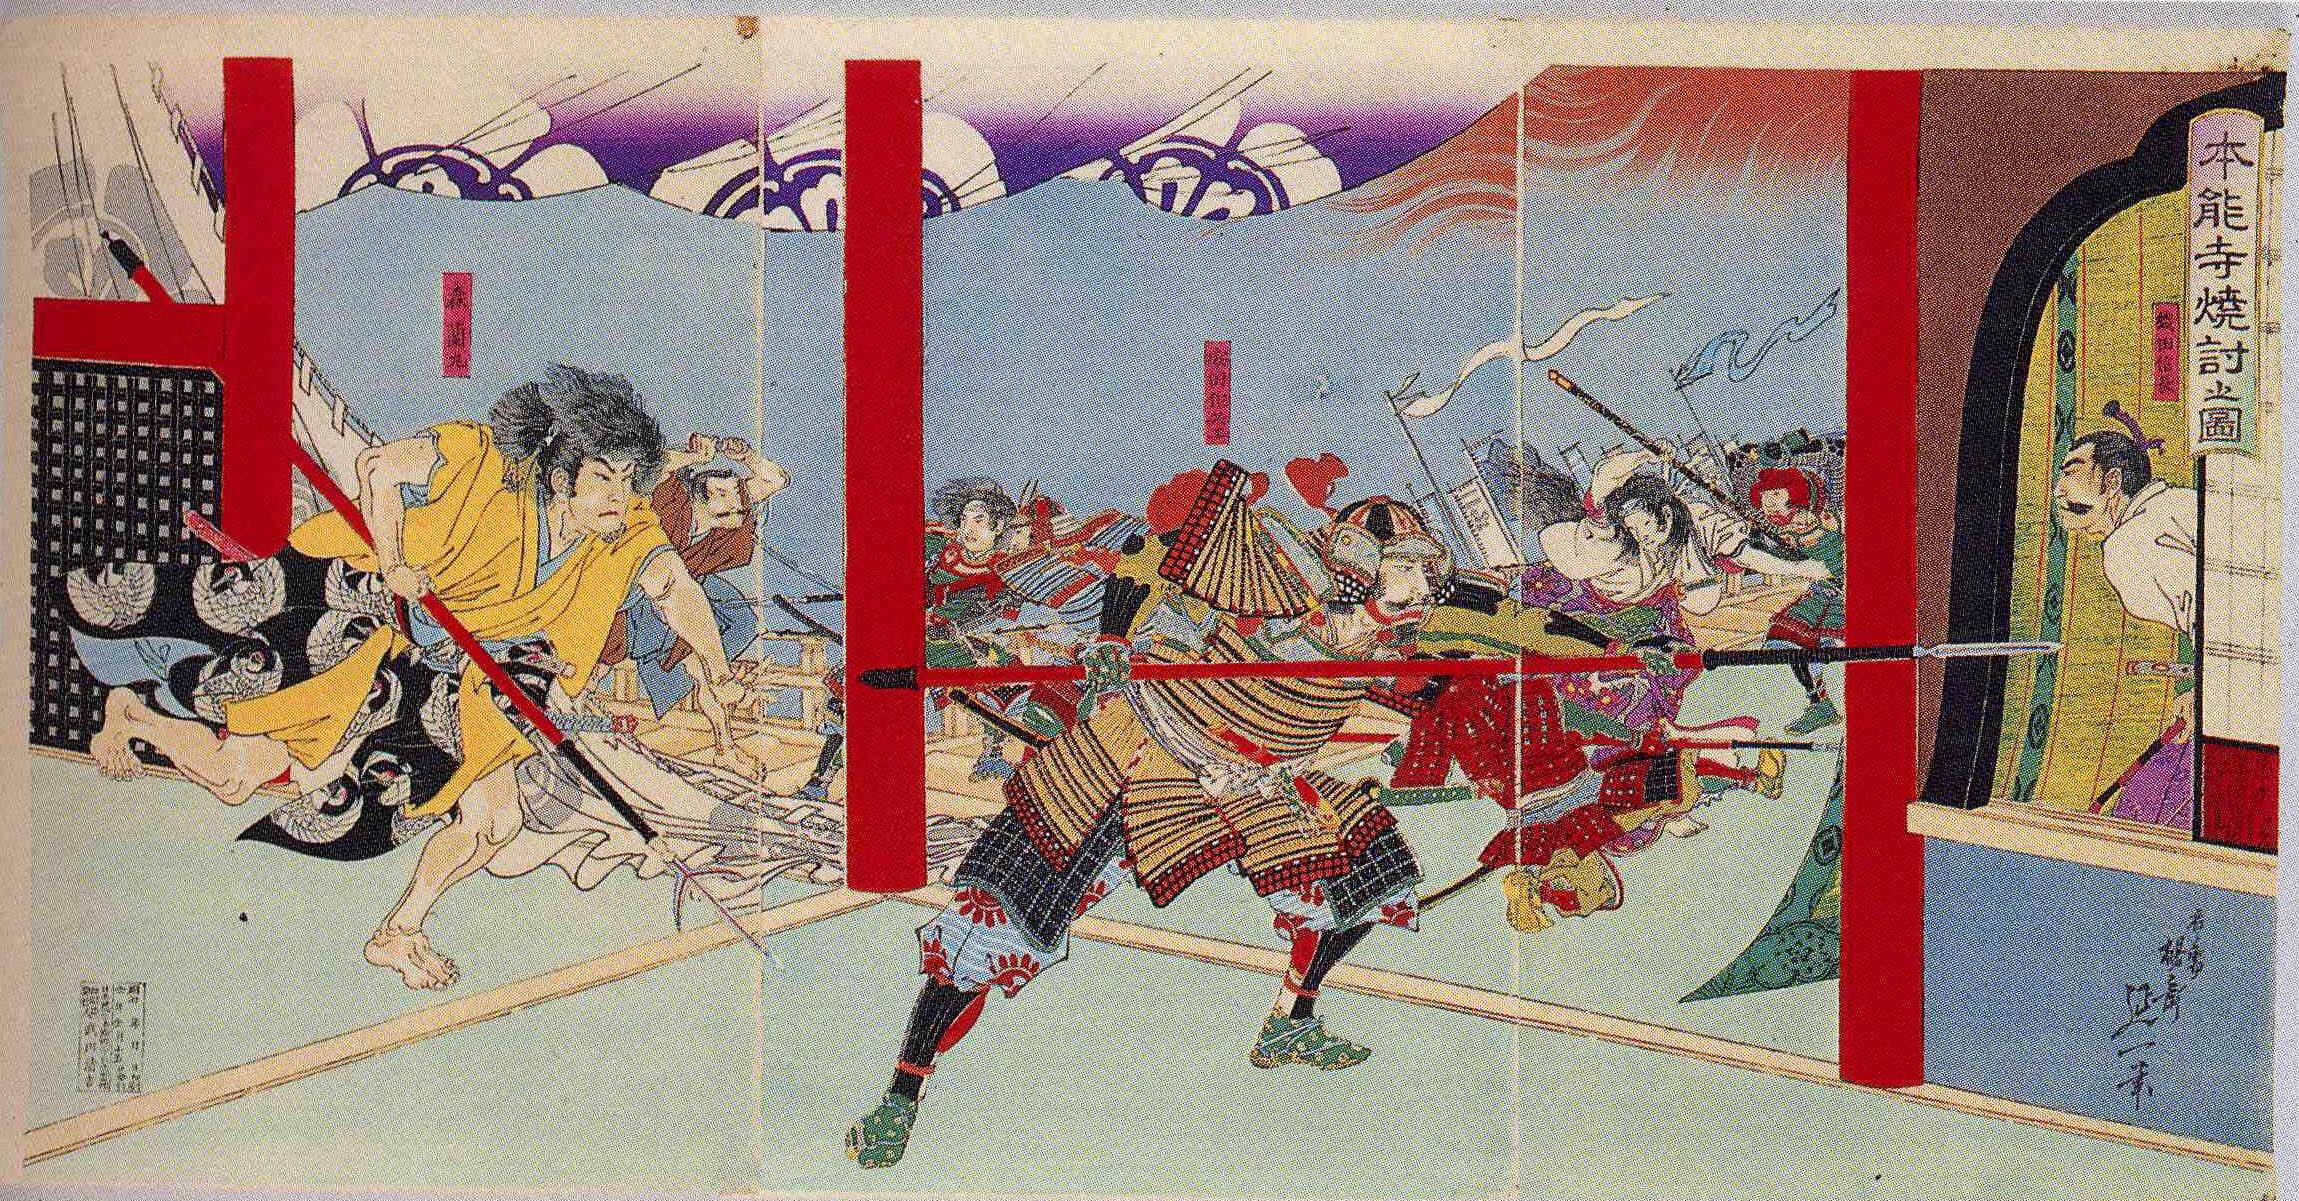 Une estampe dépeignant l'attaque du Honno-ji, lors de laquelle Oda Nobunaga fût contraint de se donner la mort.